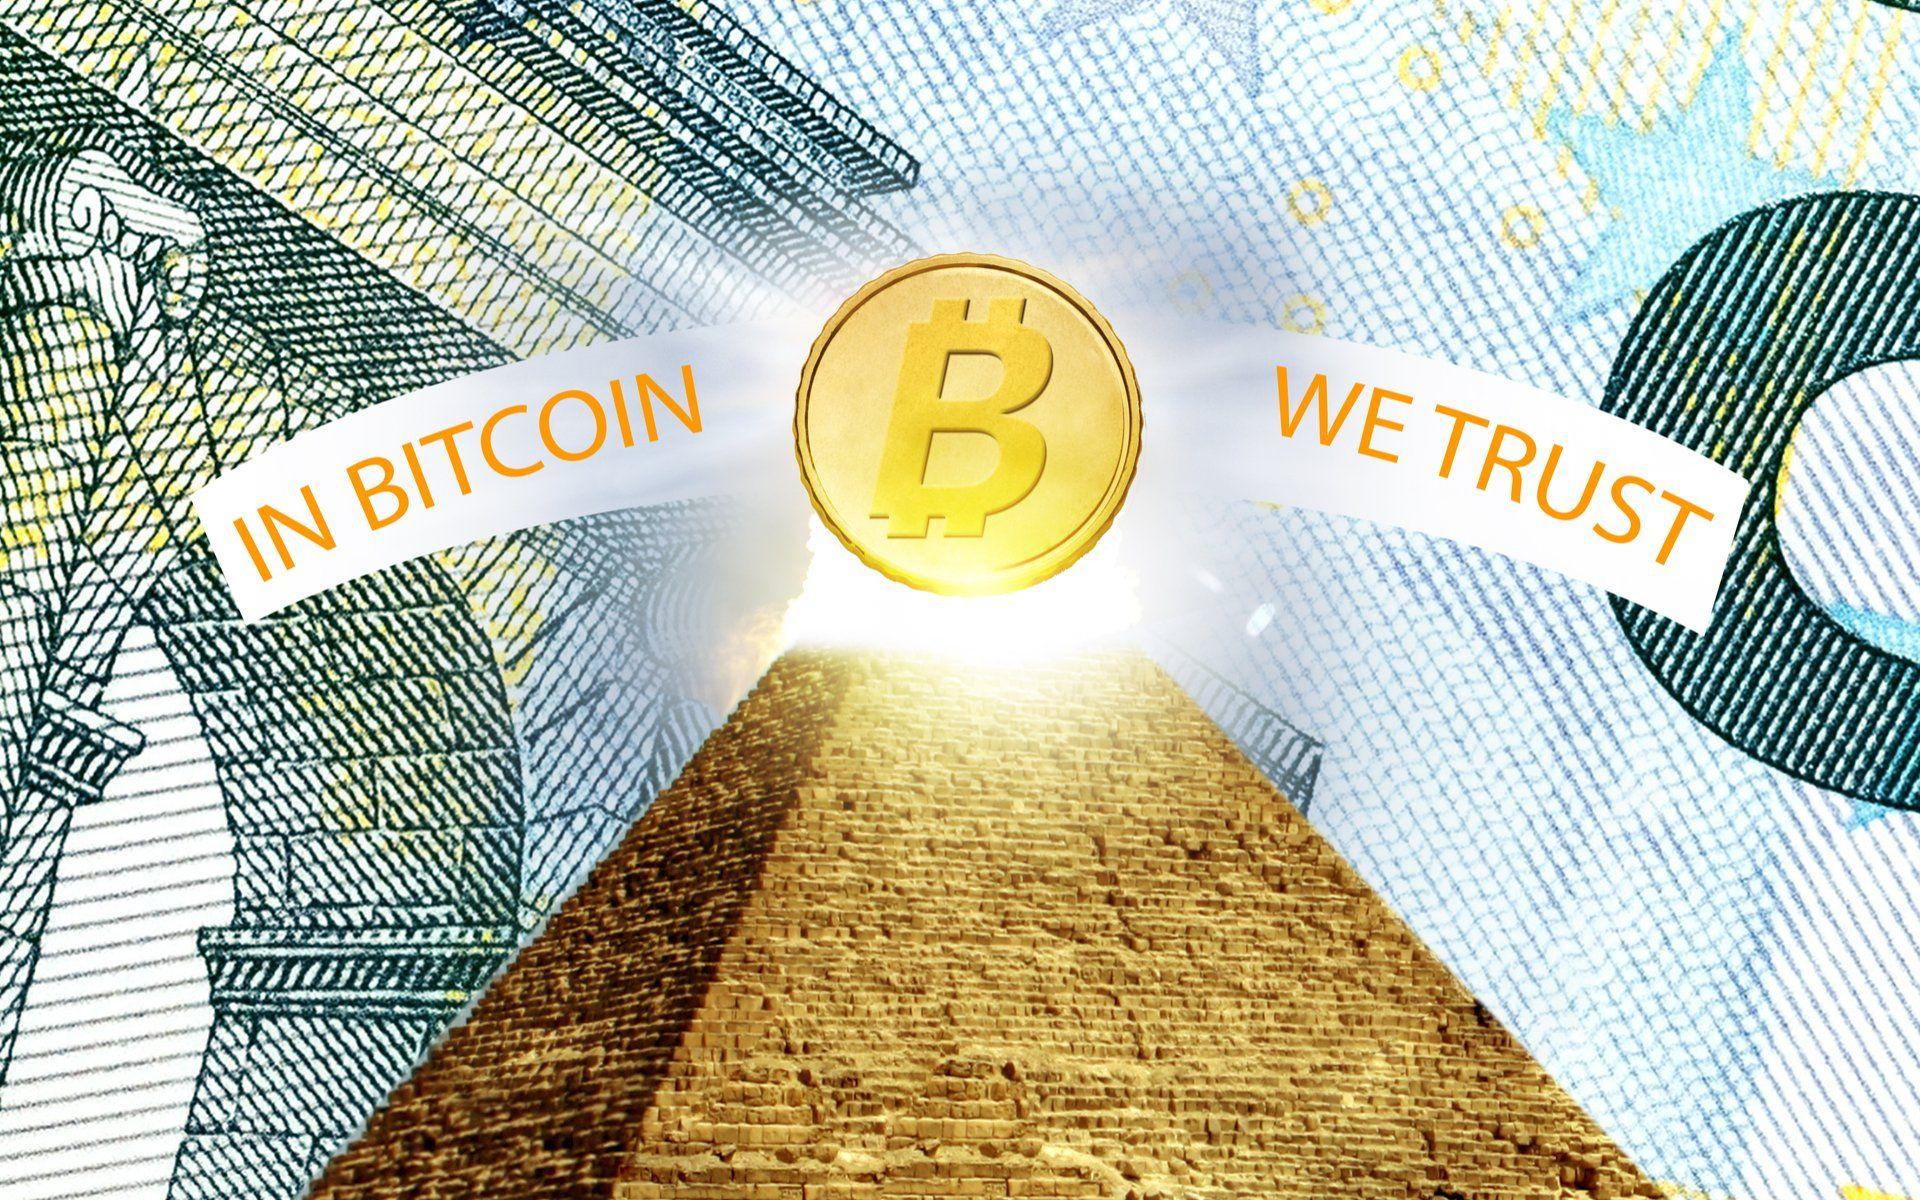 CryptoNews on Bitcoin, Big battle, Bitcoin transaction